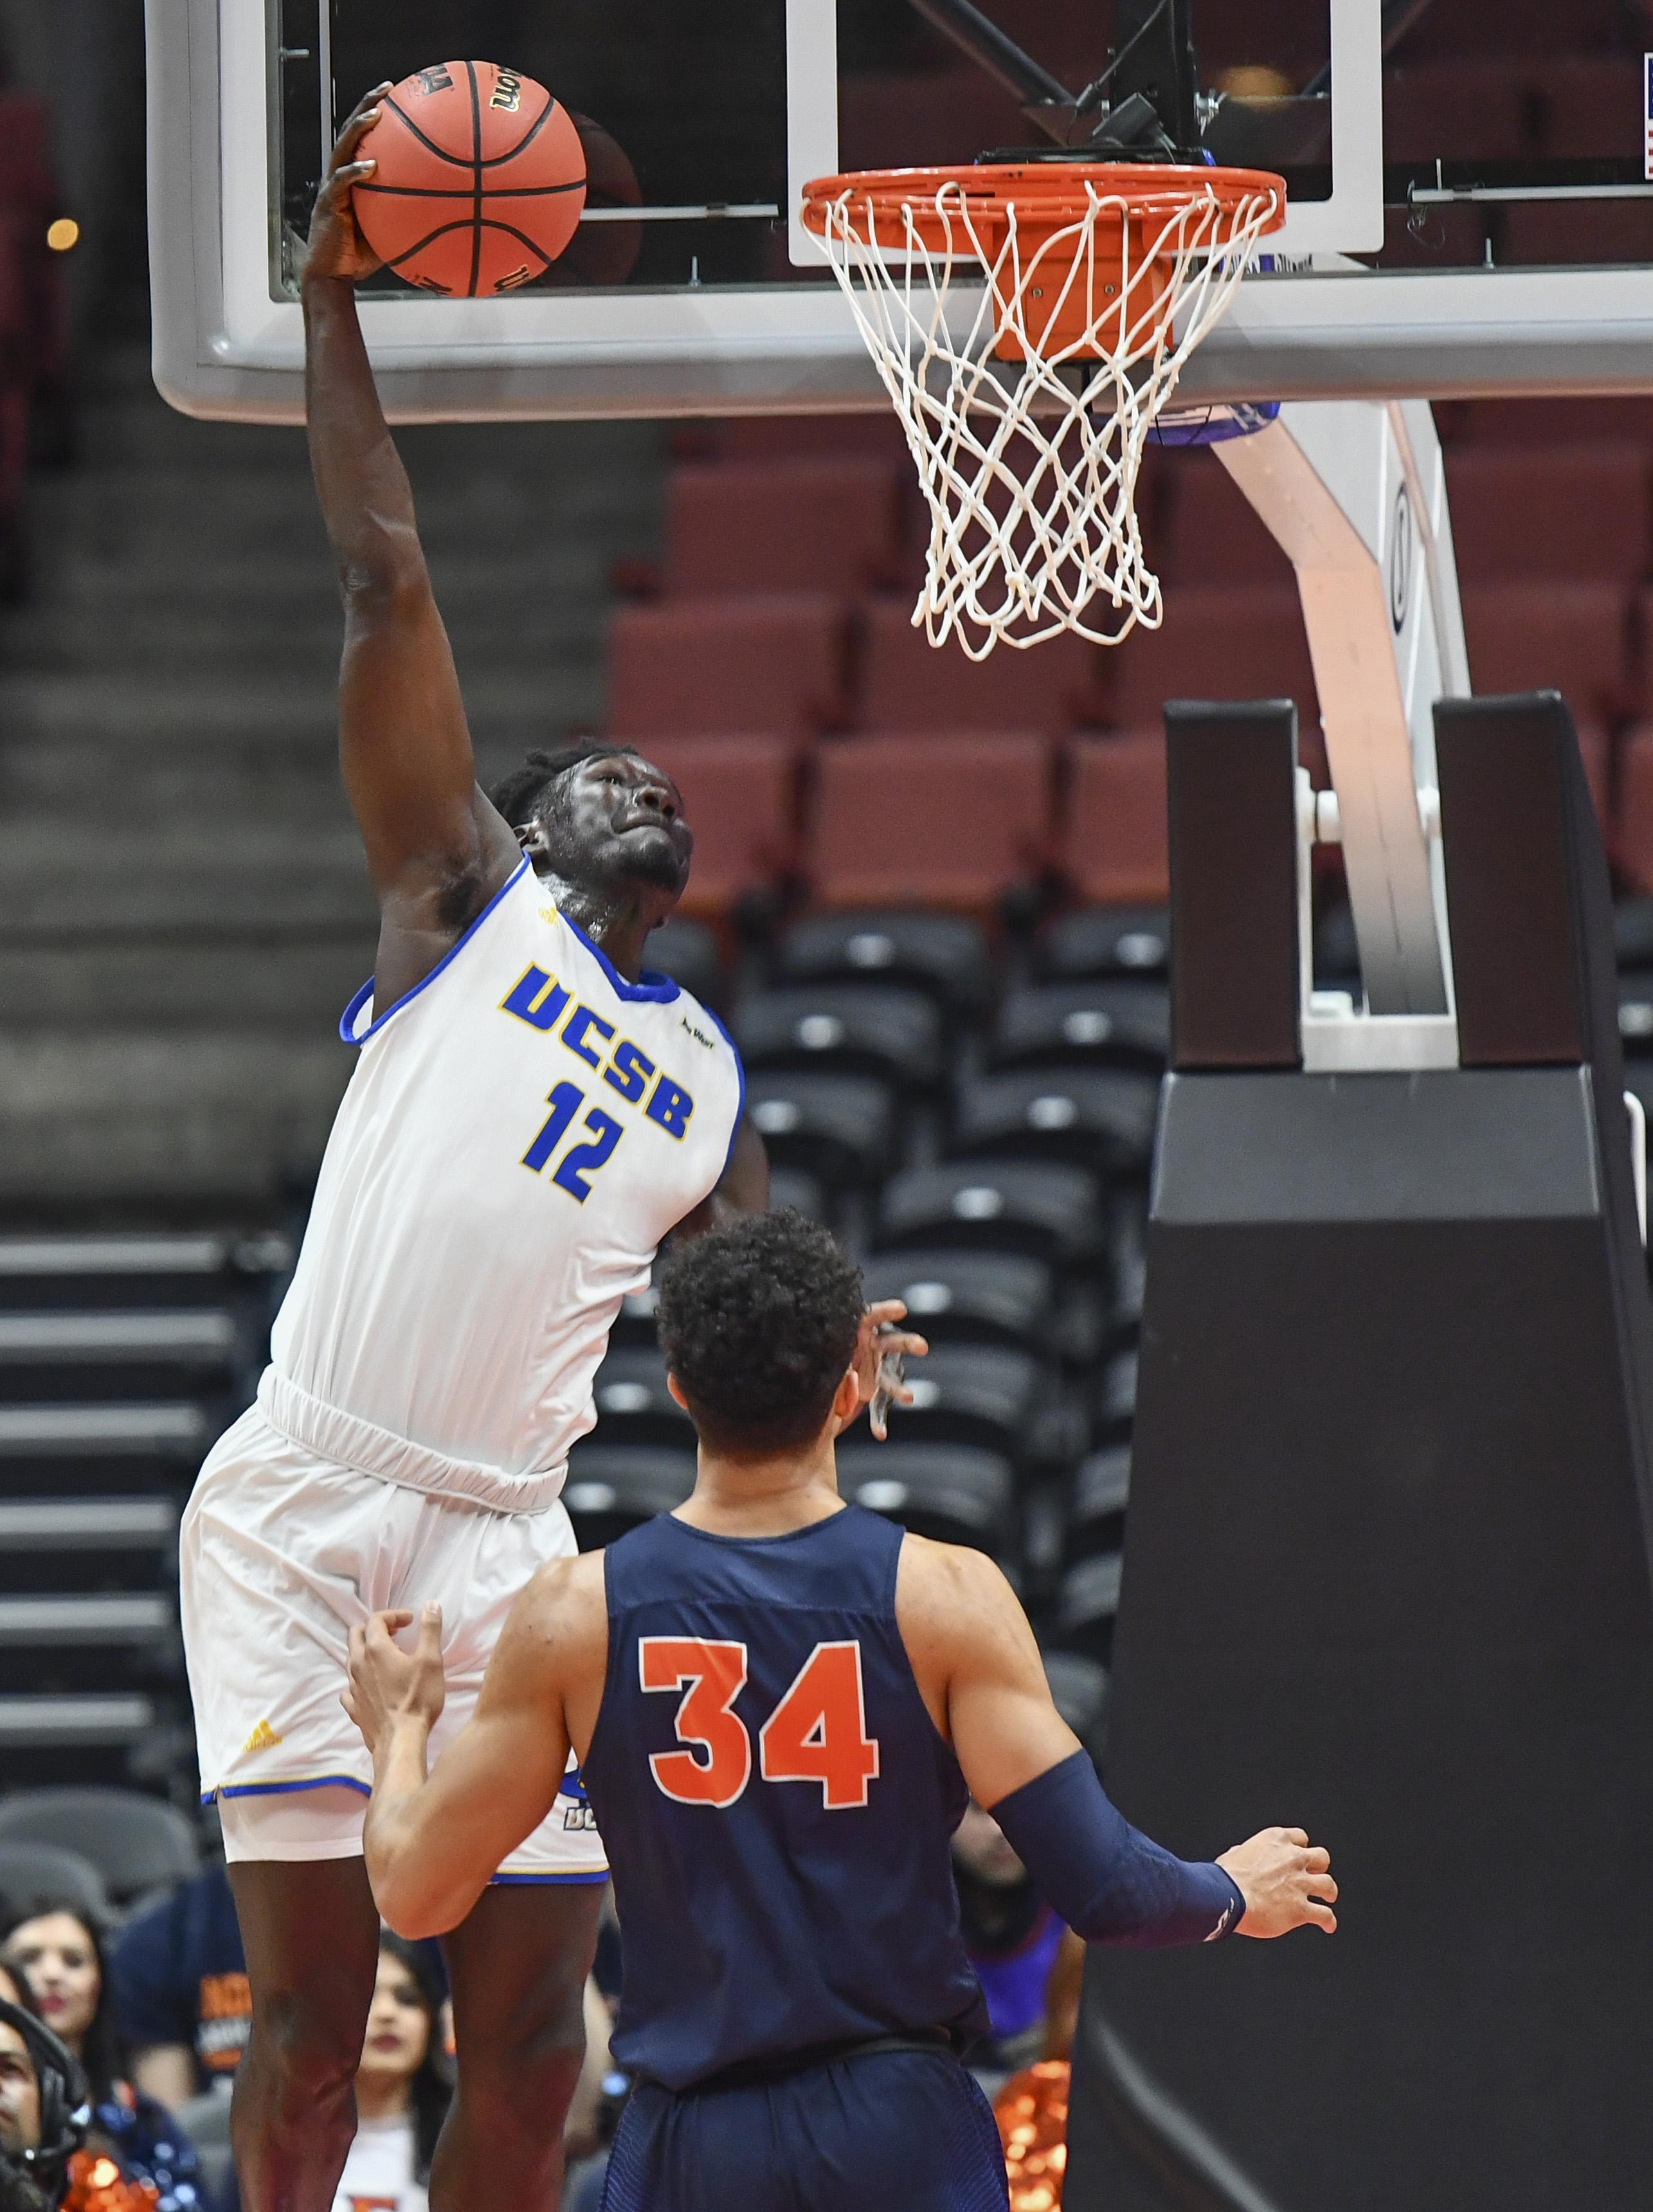 NCAA Basketball: Big West Conference Championship-Cal State Fullerton vs. UC Santa Barbara